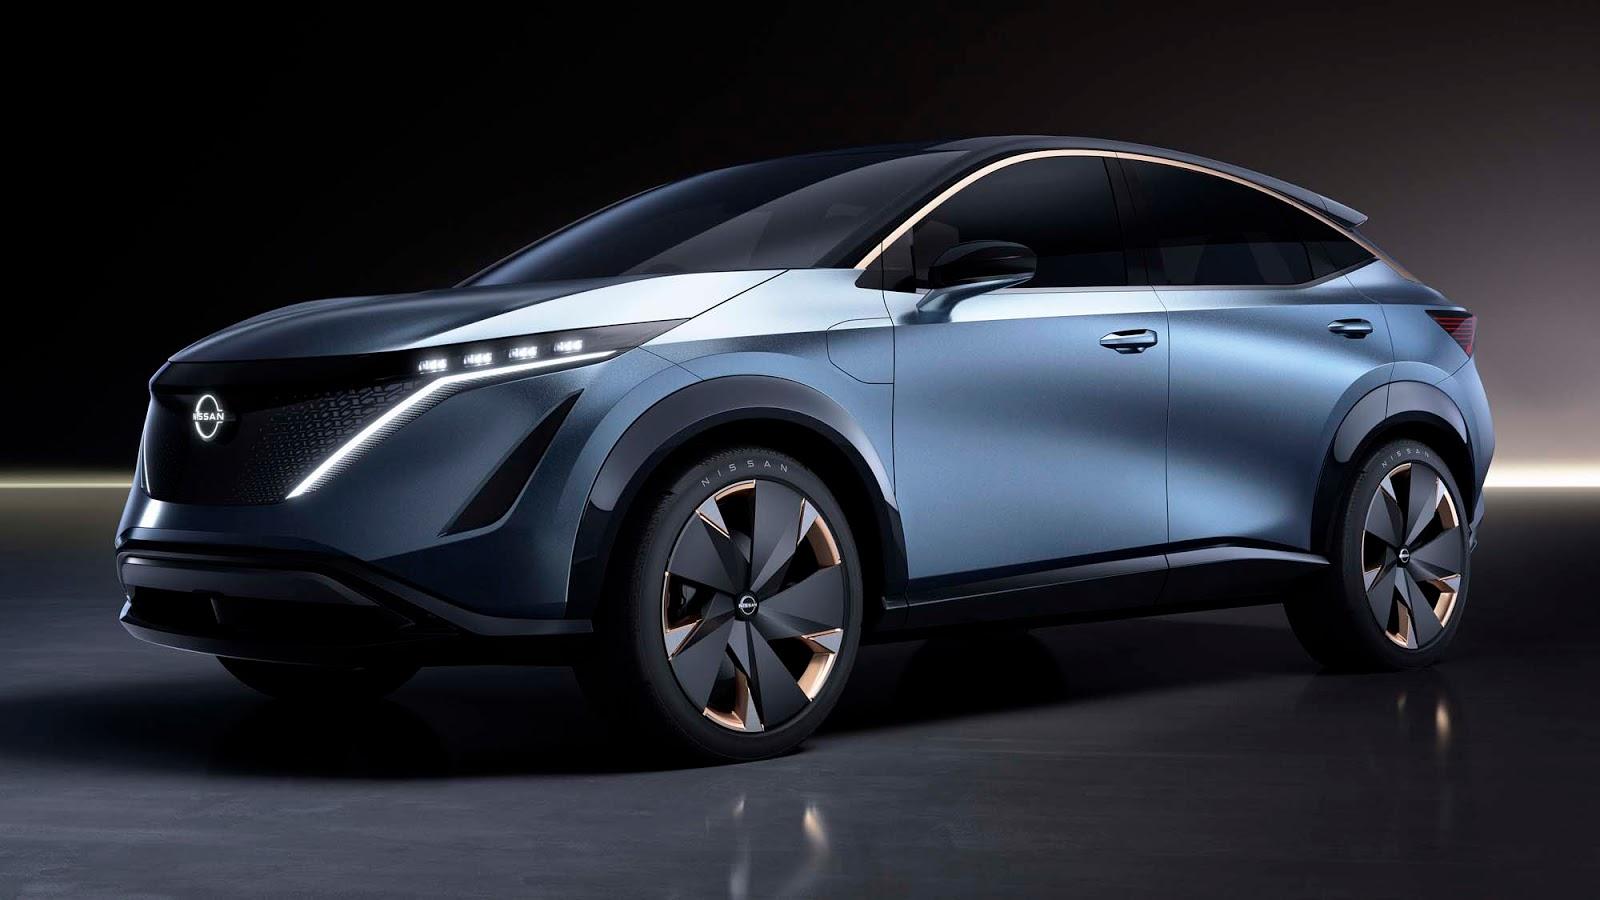 Nissan2BARIYA2BConcept 05 Με αυτό το μοντέλο η Nissan μας δείχνει το μέλλον της Electric cars, Nissan, Έκθεση, ιαπωνικά